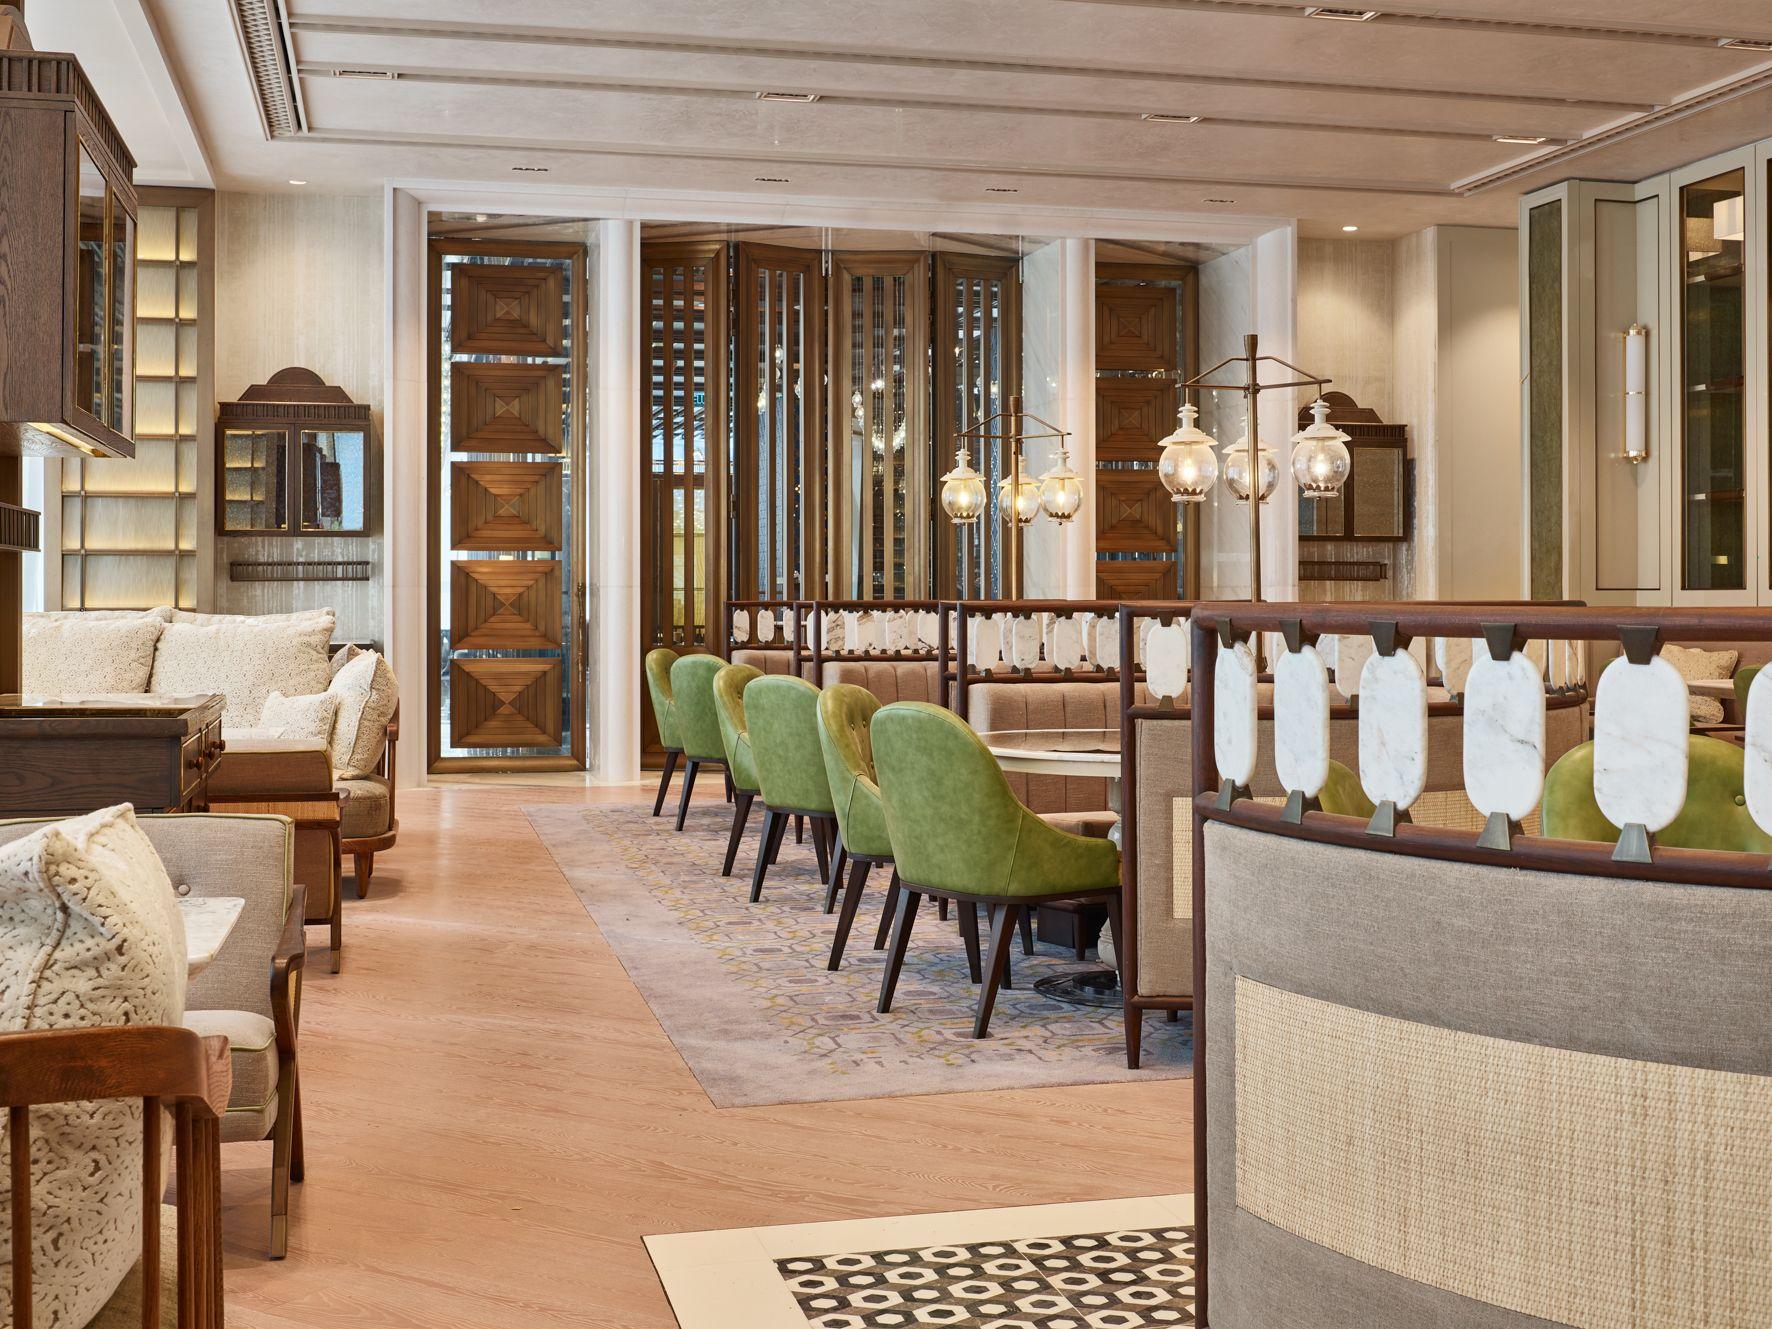 Yun House The Lounge And Bar Trigona Four Seasons Kuala Lumpur